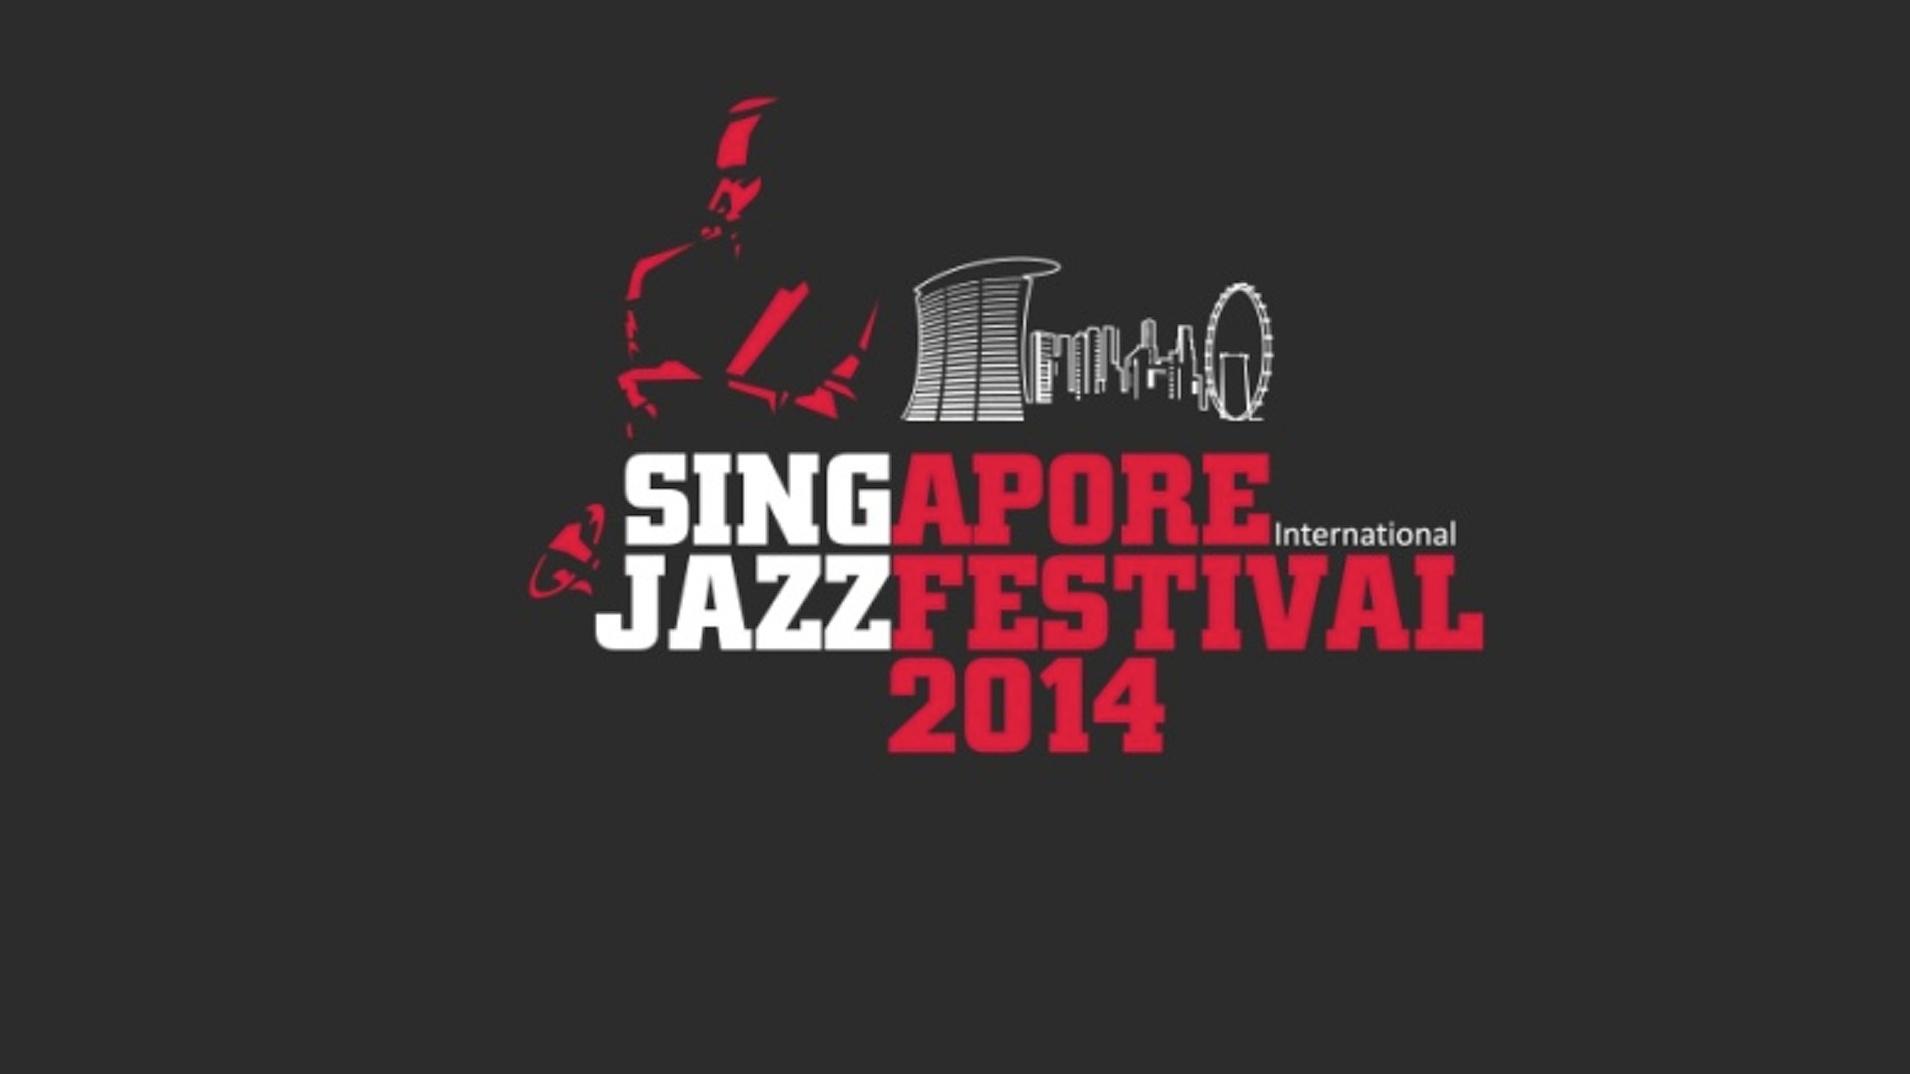 Singapore International Jazz Festival (Day 2)